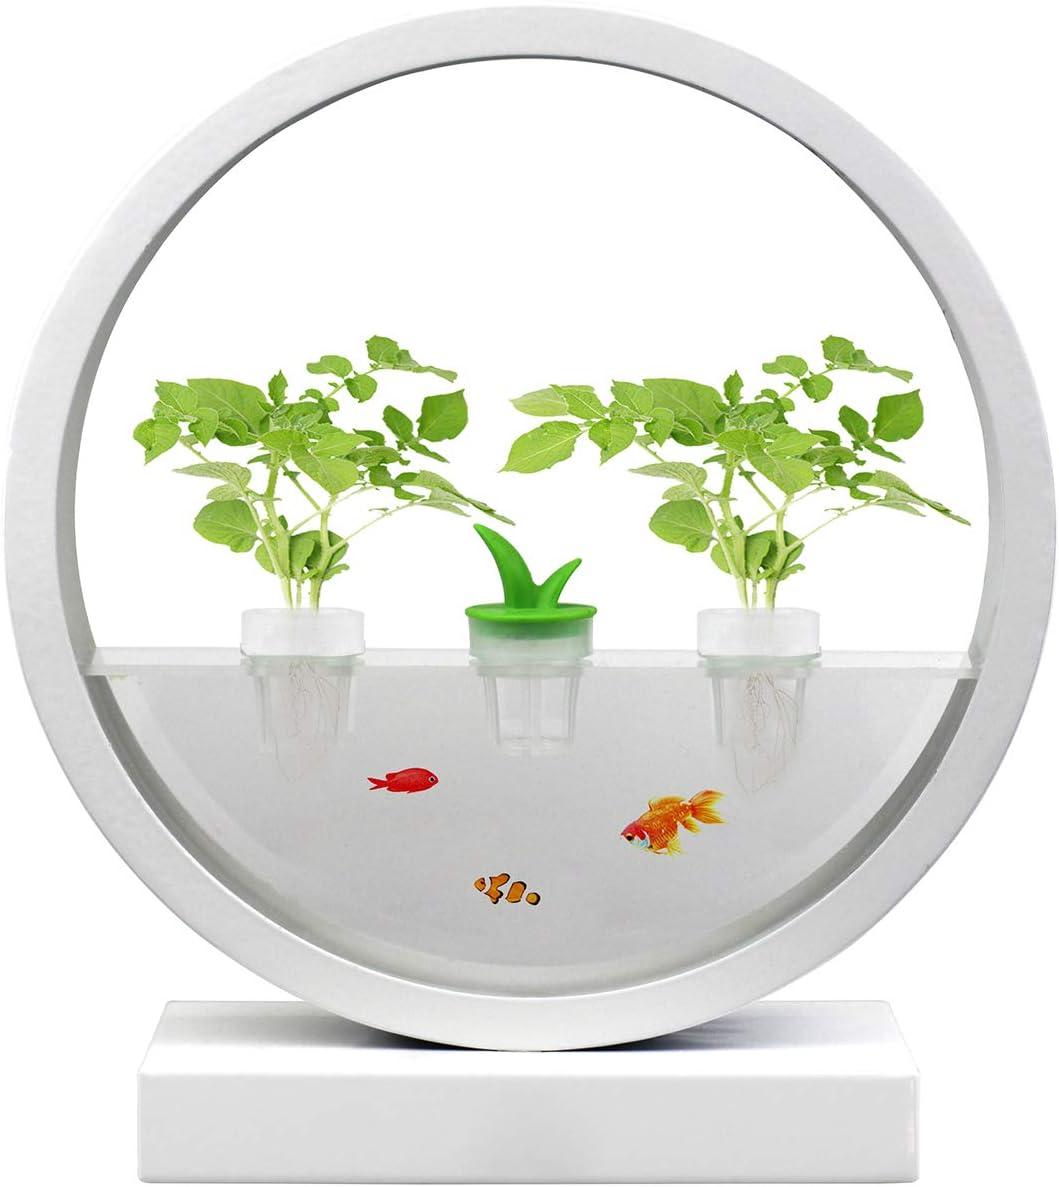 VegeBox Hydroponics Growing System with LED Indoor Garden Light, Indoor Herb Garden, Automatic Garden Kit, Home DIY Decoration (White)